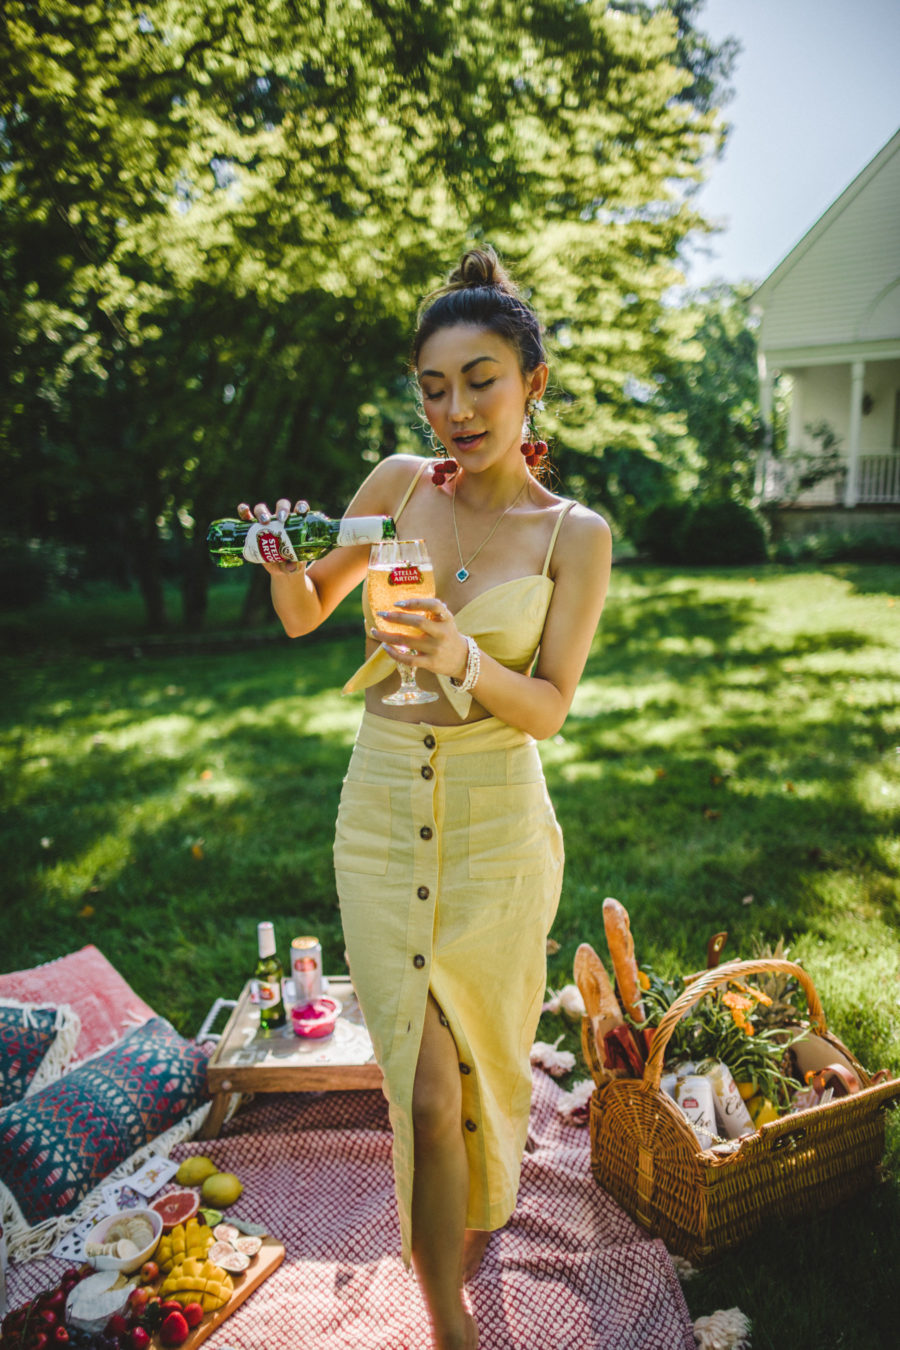 Savoring Everyday Moments with Stella Artois, Joie de Biere, Outdoor Picnic, Summer picnic, Stella Artois // Notjessfashion.com